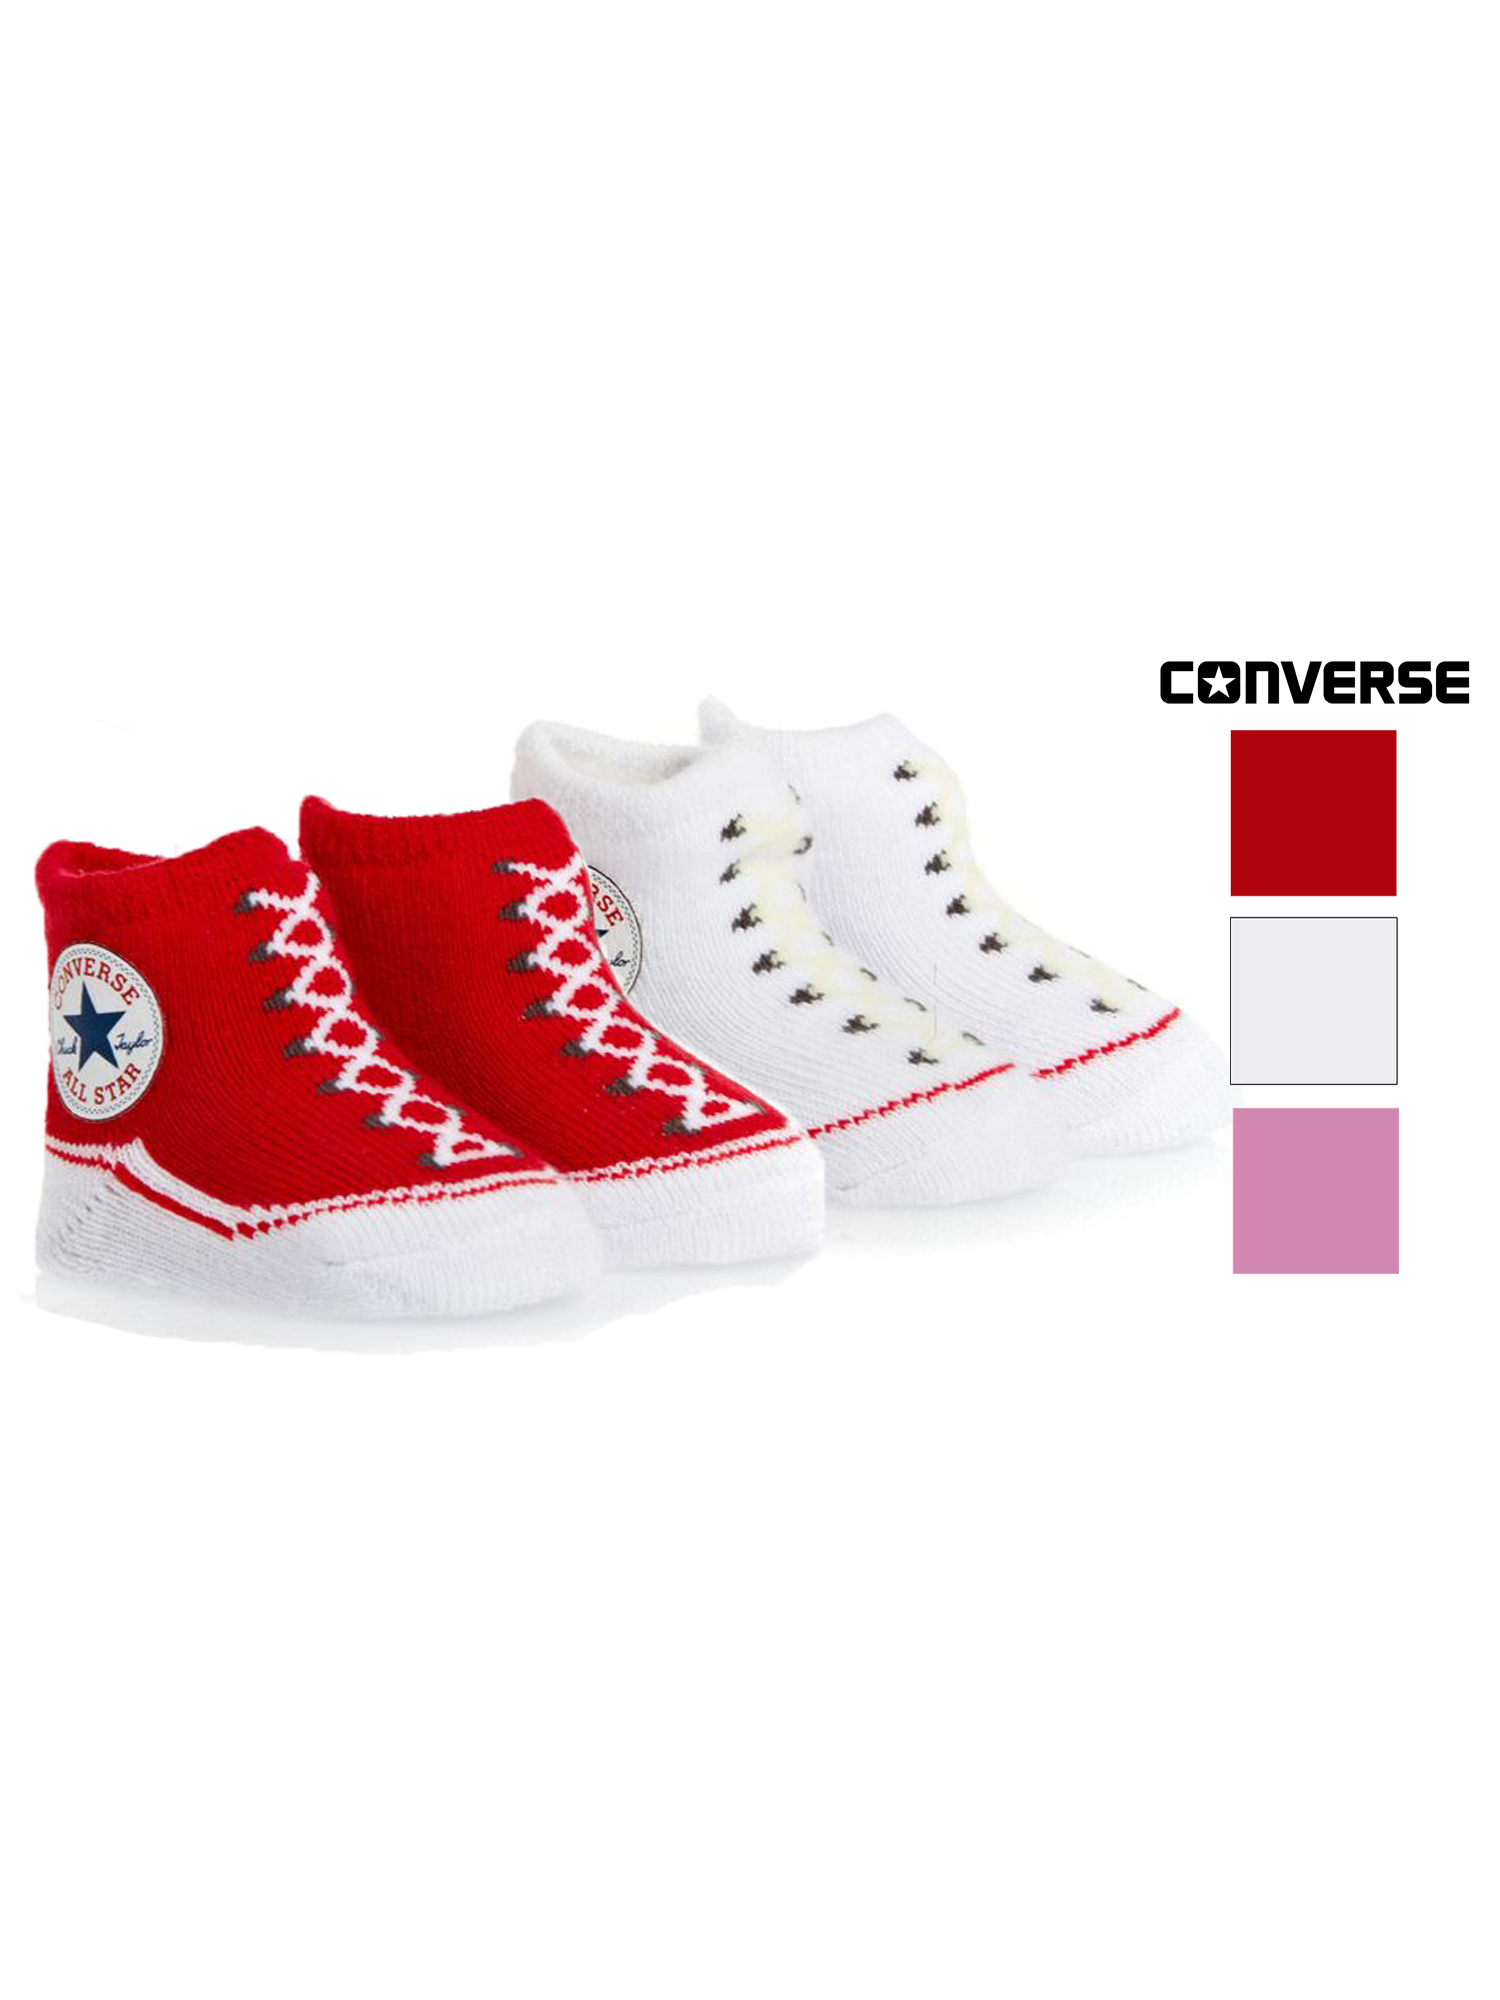 2converse gift set